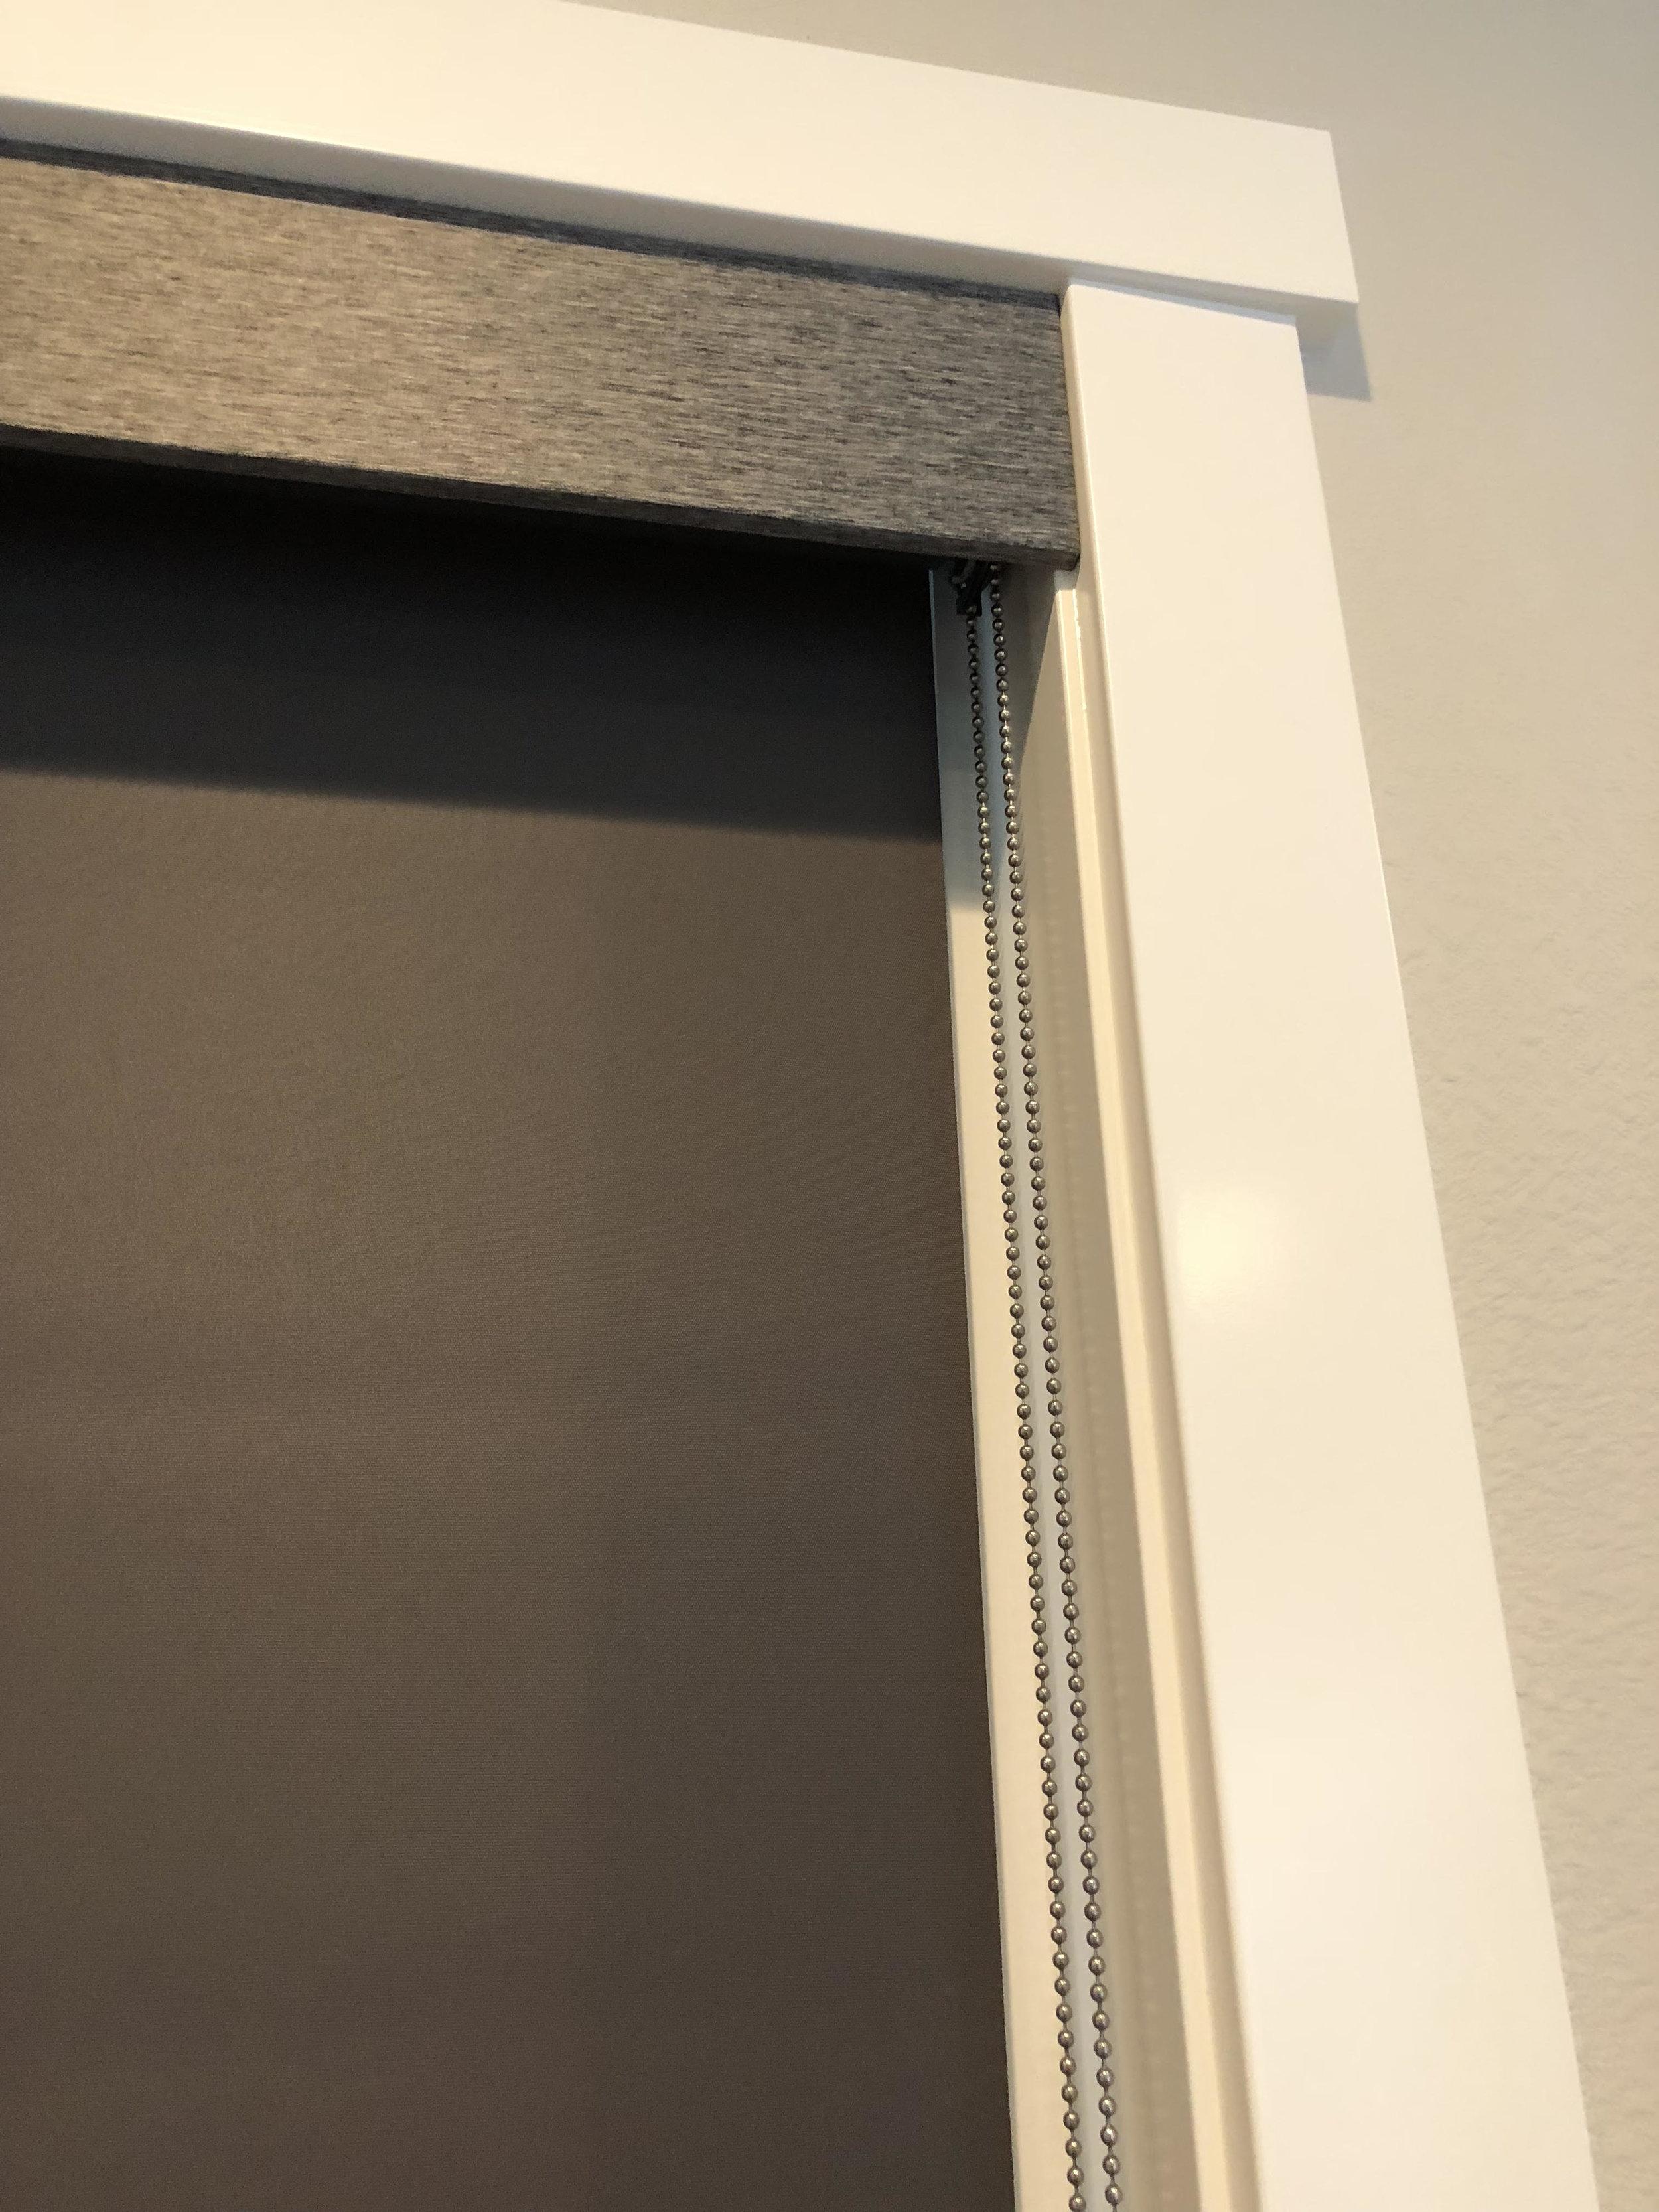 Room Darkening Roller Shade with Fabric Trim Valance